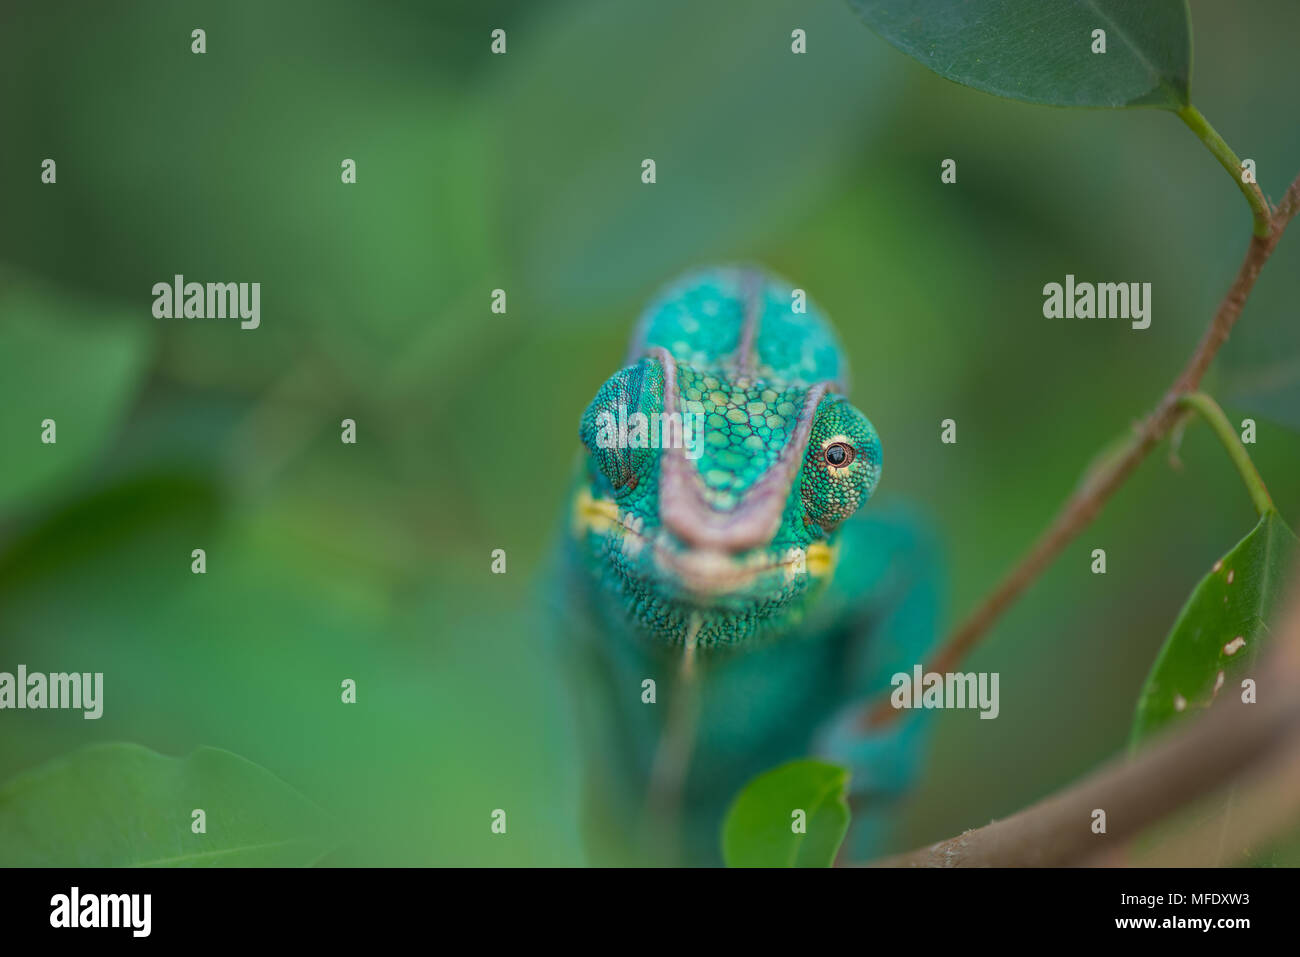 Panther chameleon with bright colors / Nosy be / Madagascar wildlife / Furcifer pardalis / Blue chameleon - Stock Image